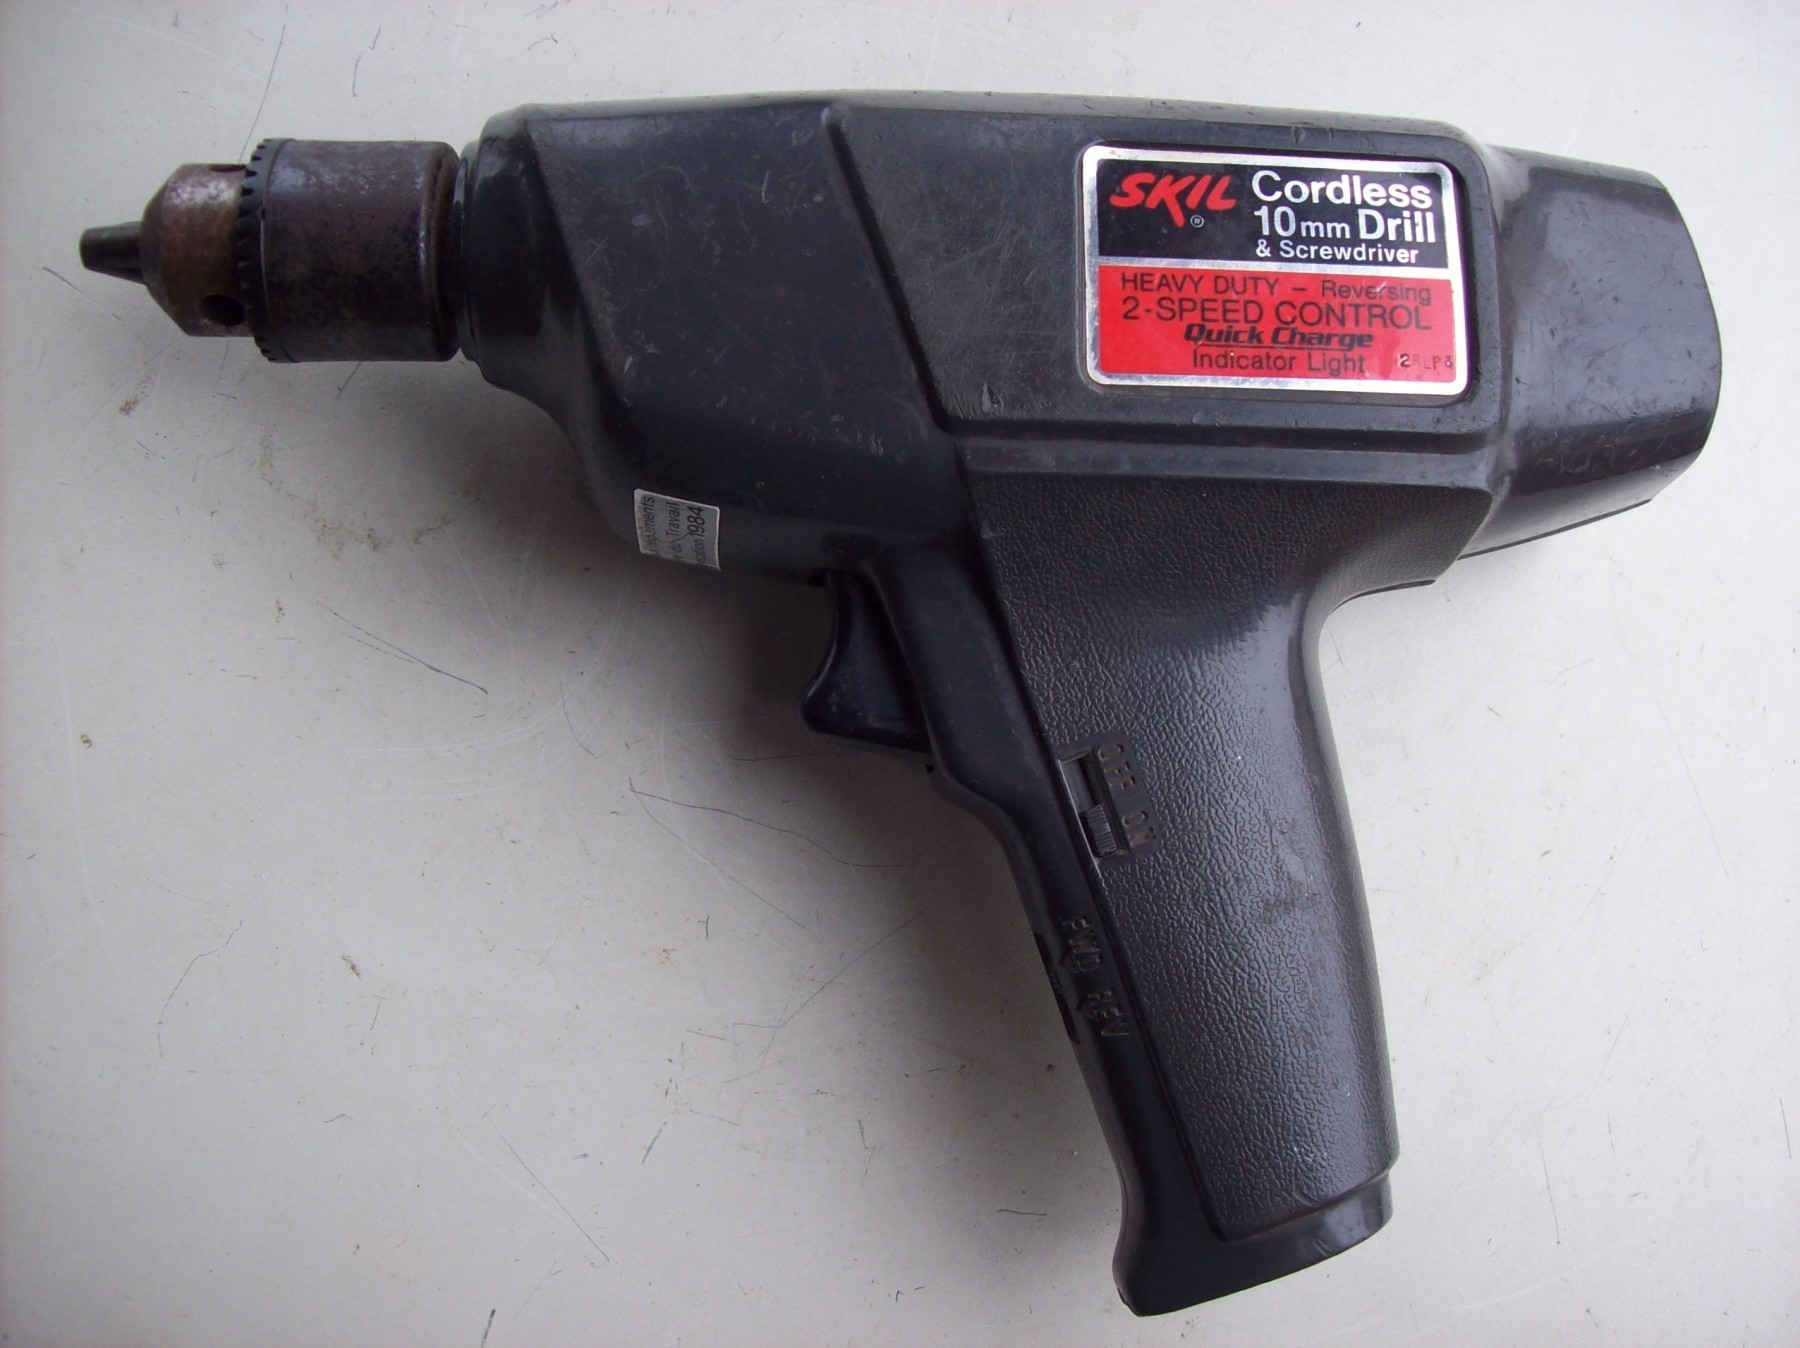 SKIL Cordless 2007 TYPE 1 Made in USA - 1984 godina